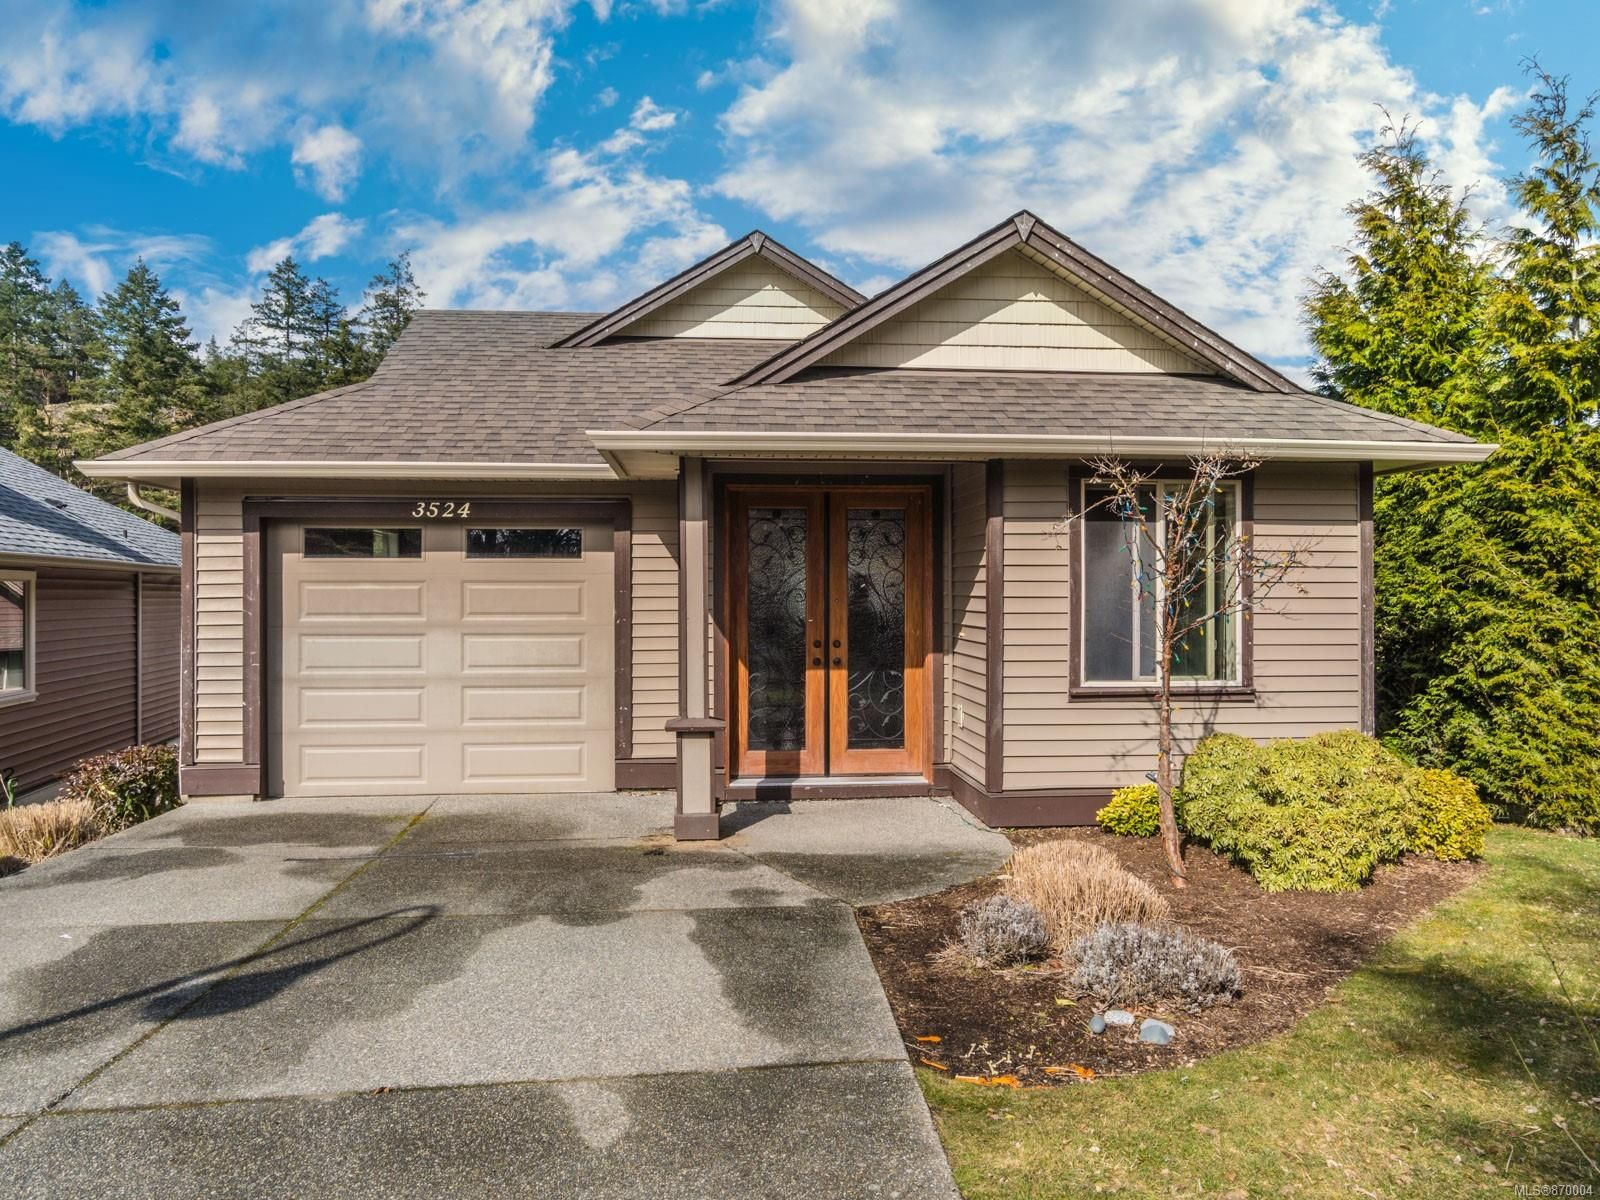 Main Photo: 3524 Radha Way in : Na Departure Bay House for sale (Nanaimo)  : MLS®# 870004